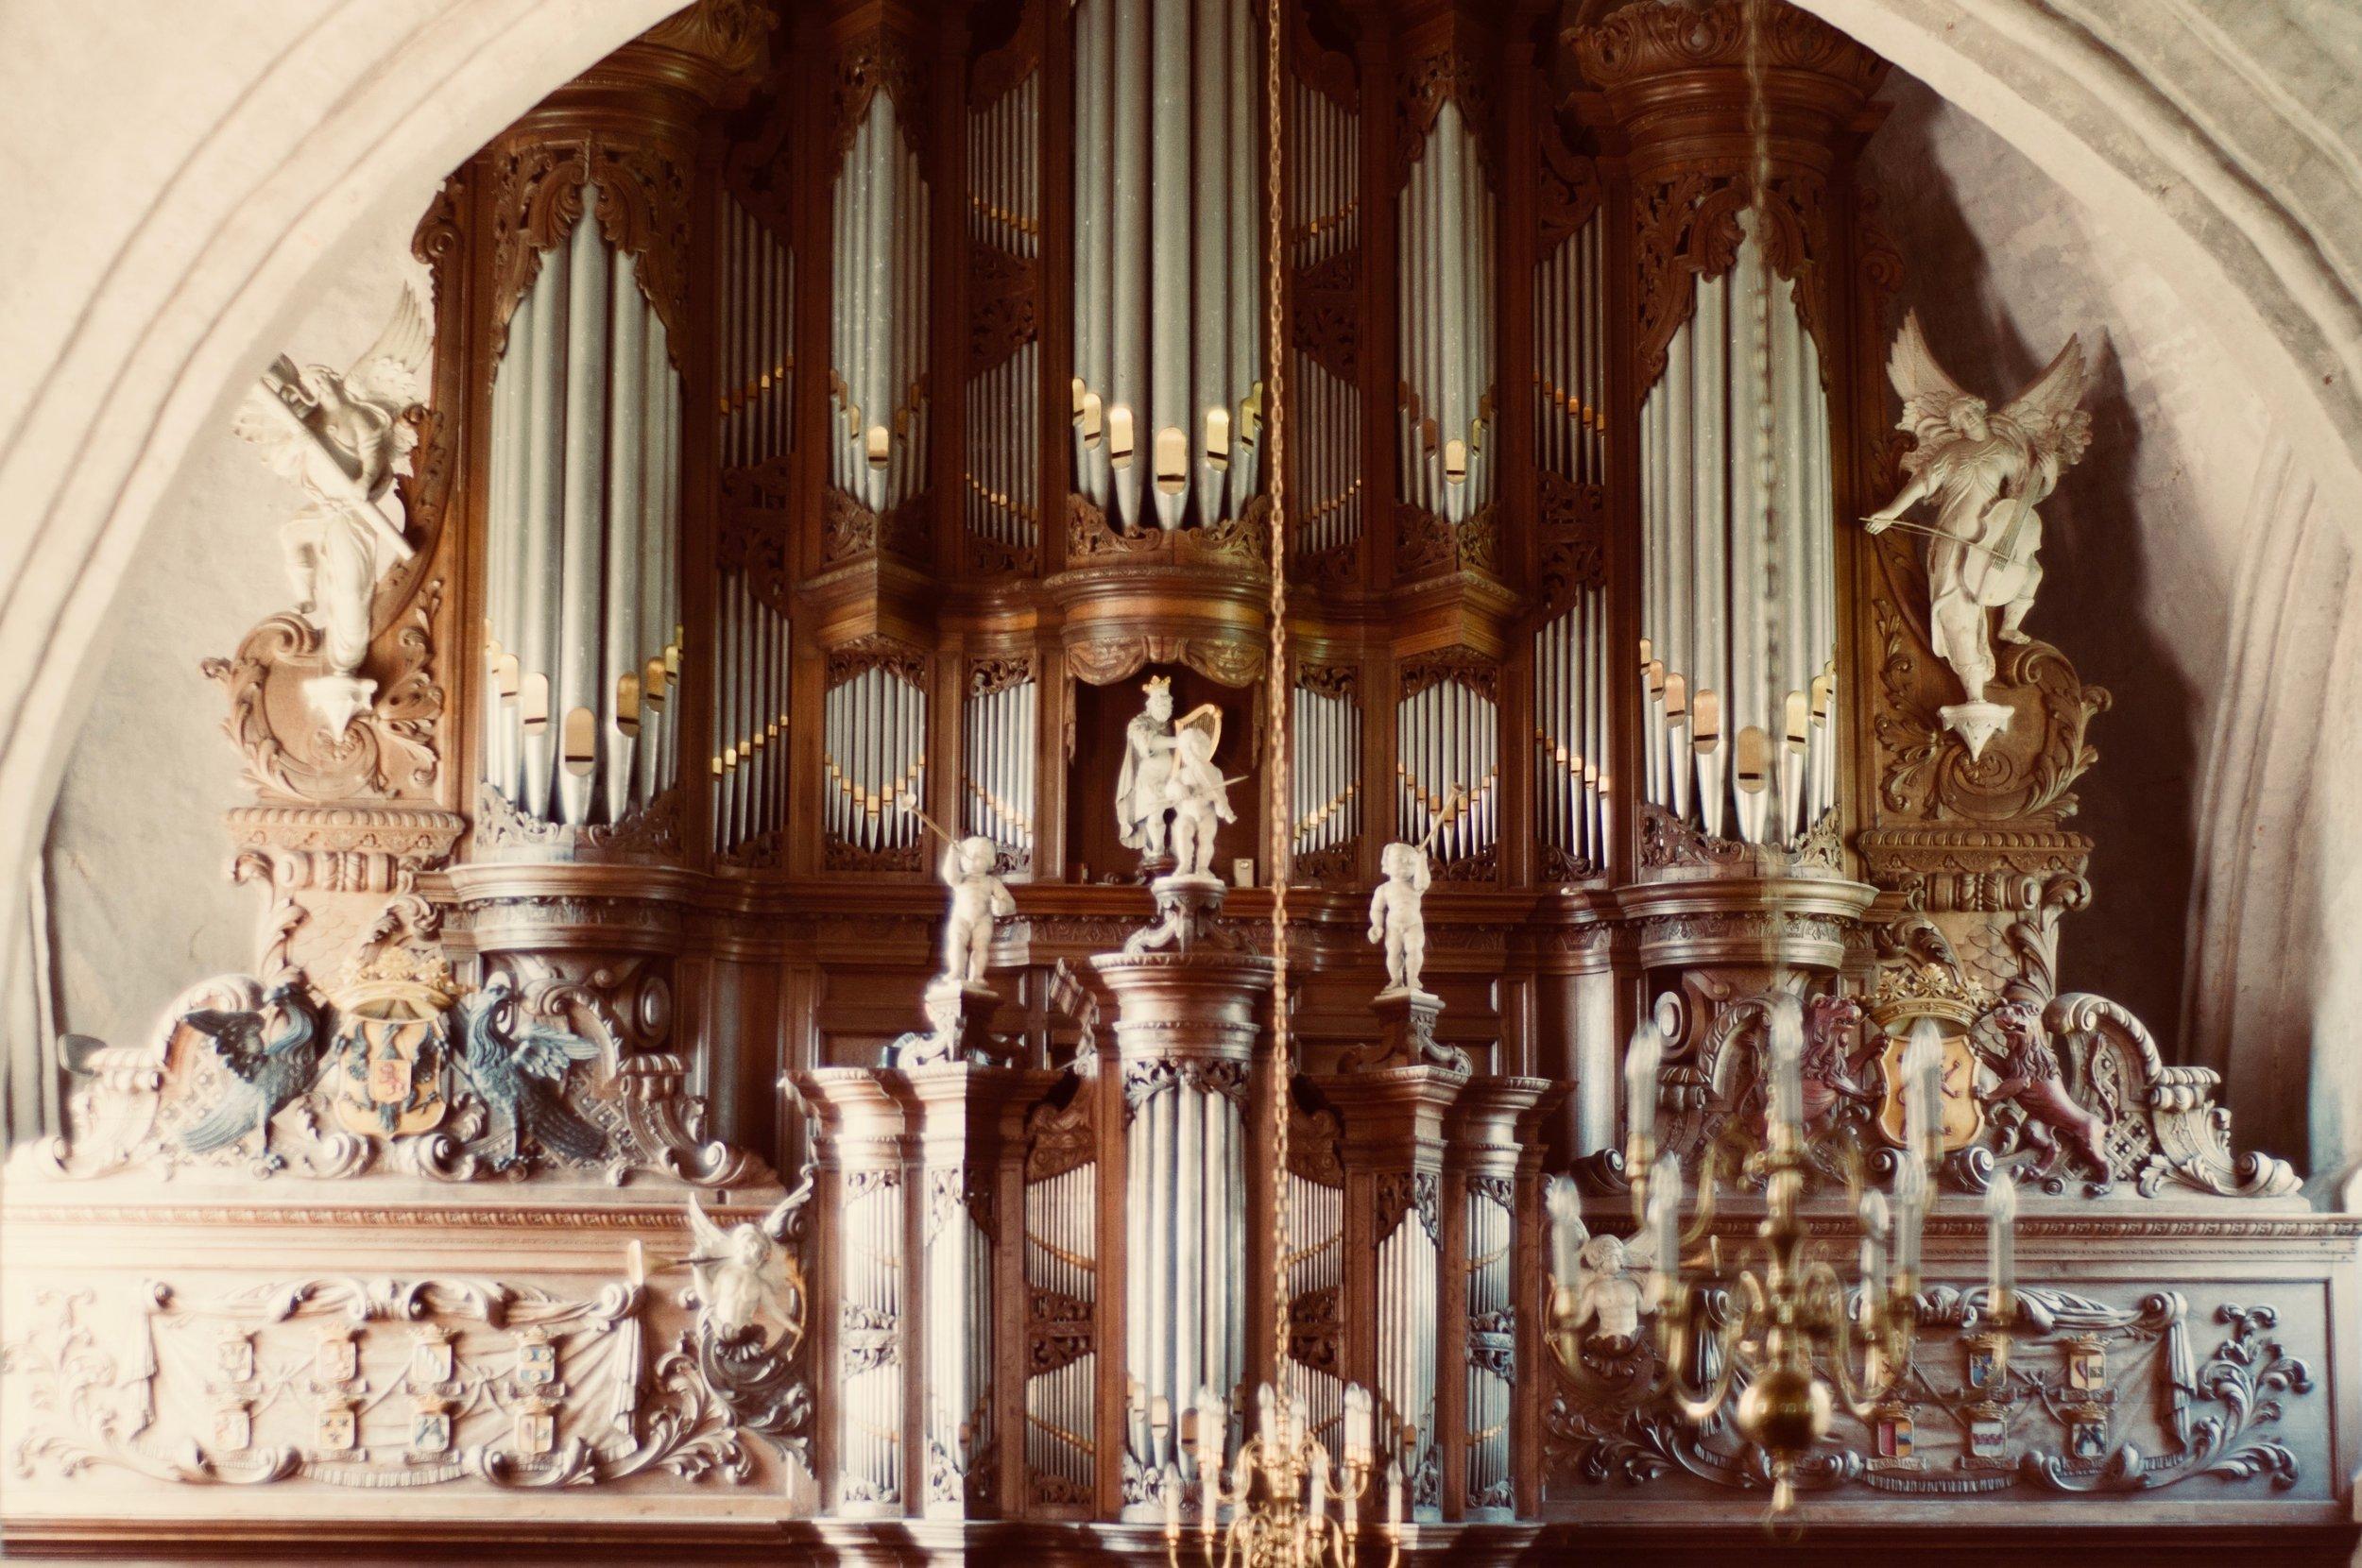 The 1733 Hinsz organ in Leens, Holland. Boston Organ Studio.